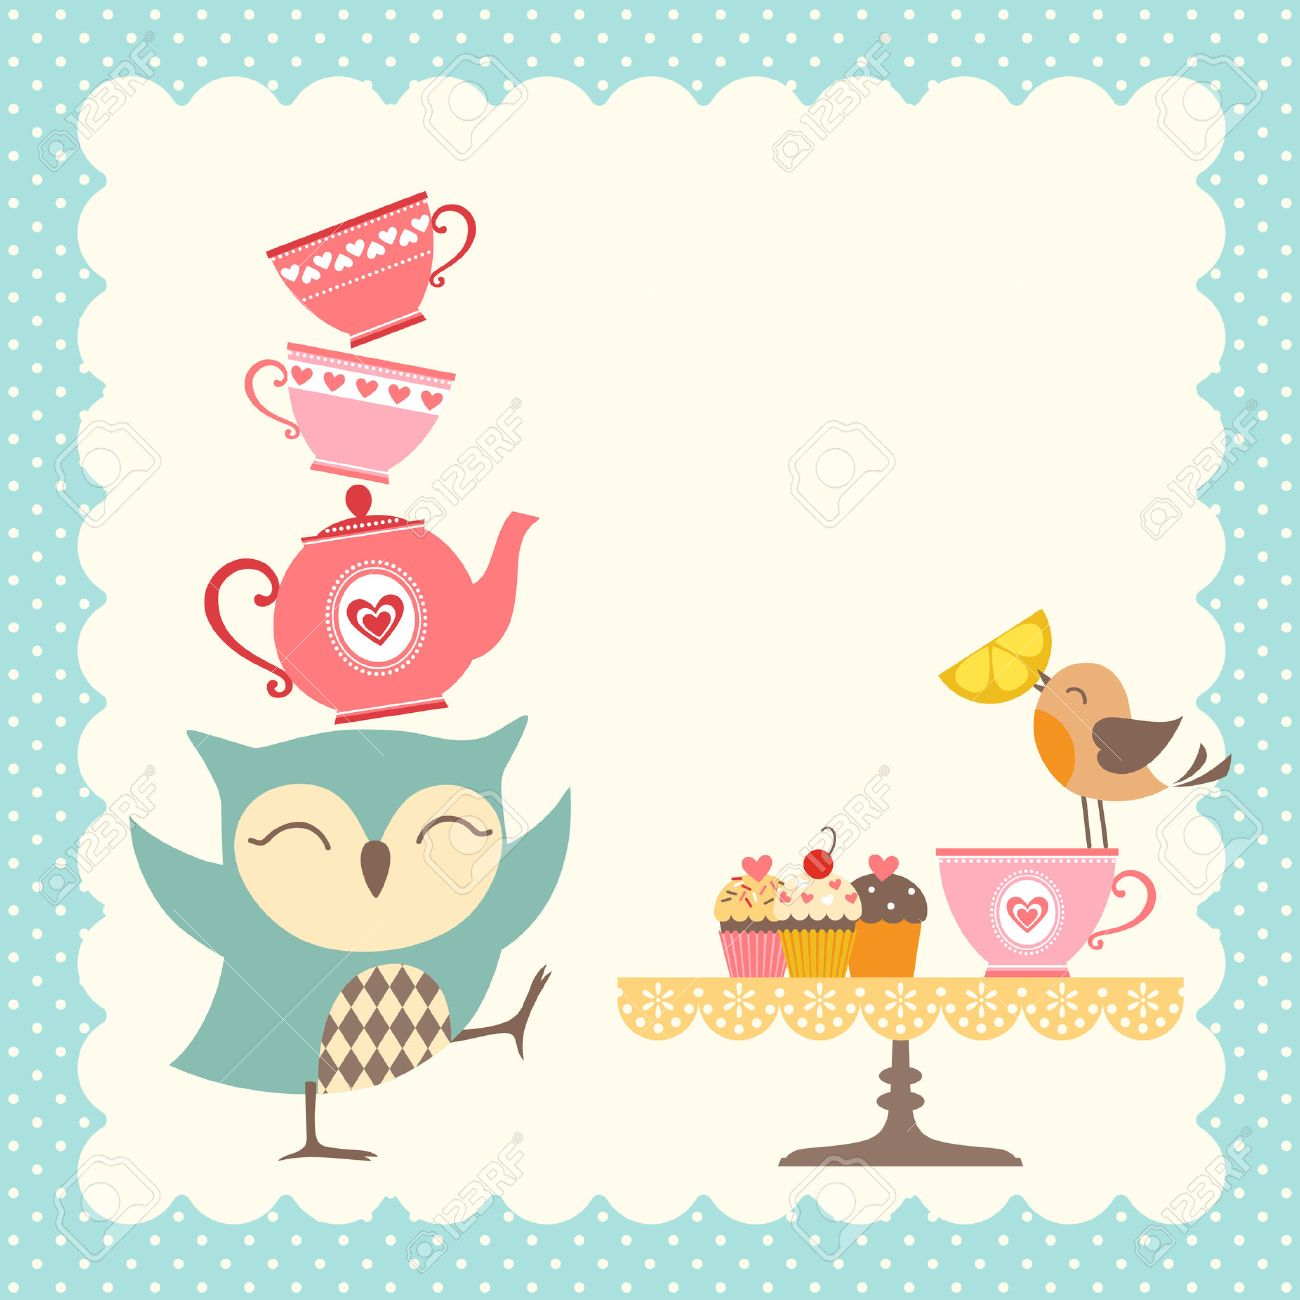 Elegant tea party invitation template with teacups cartoon vector - Tea Party Funny Owl Giving A Very Good Tea Party Illustration